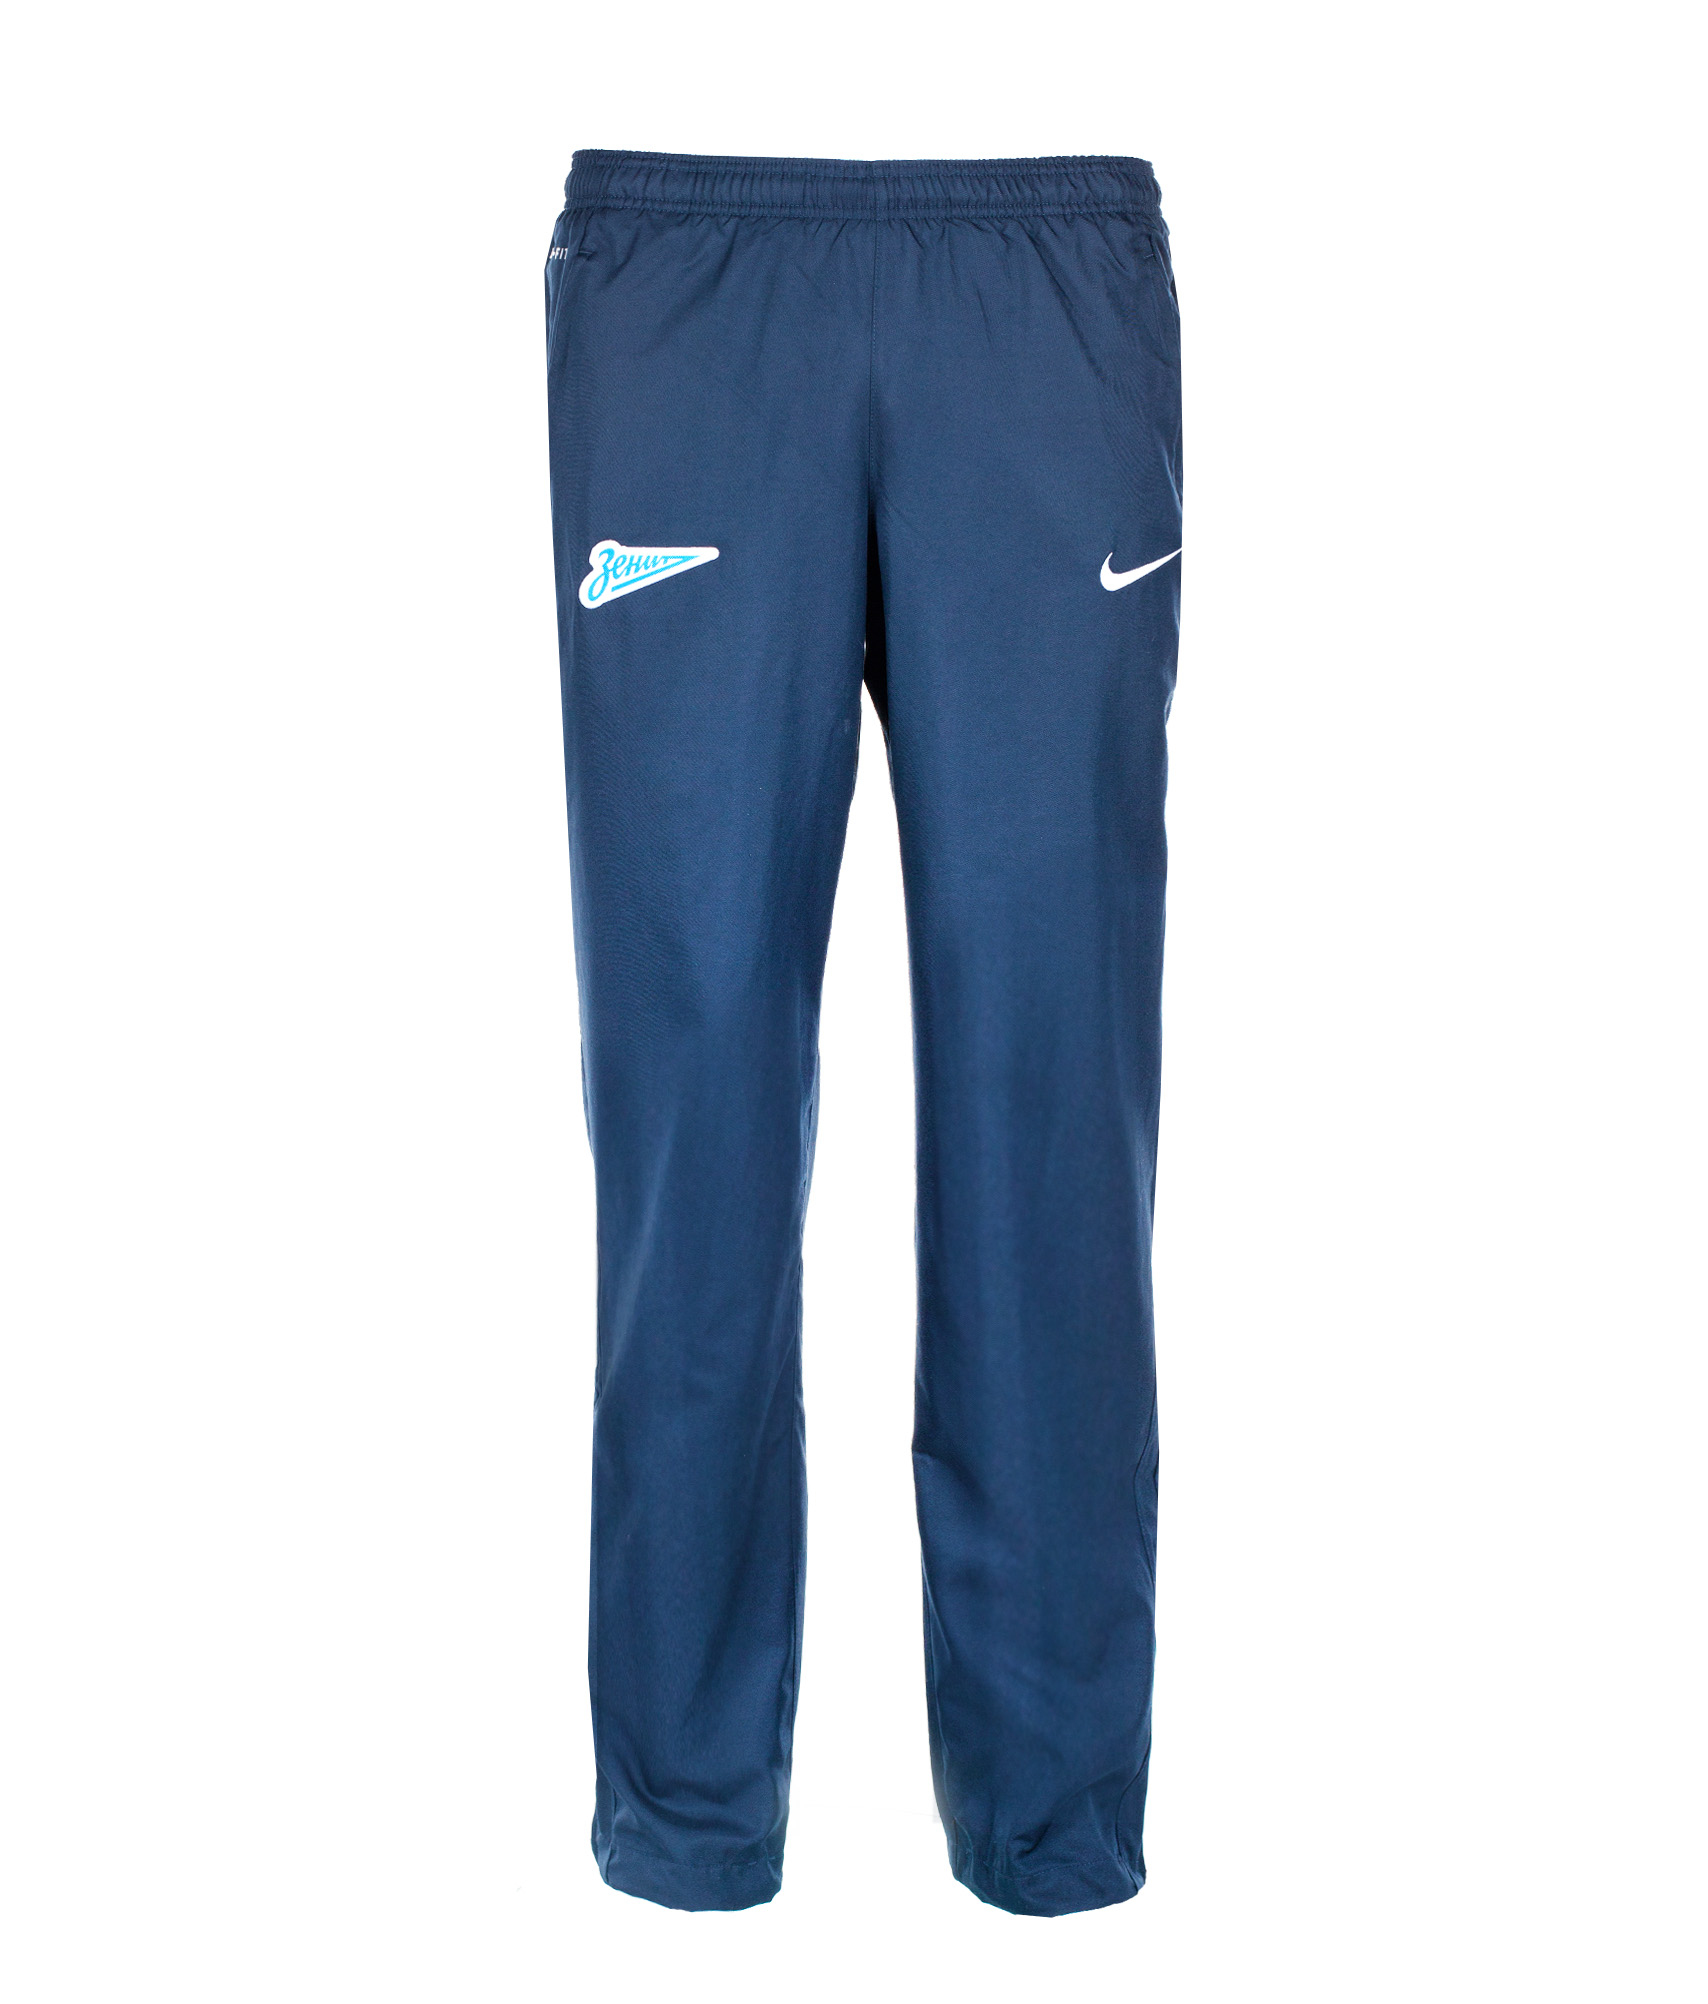 Брюки Nike Zenit Select Sdln WVN Pant, Цвет-Синий, Размер-XXL